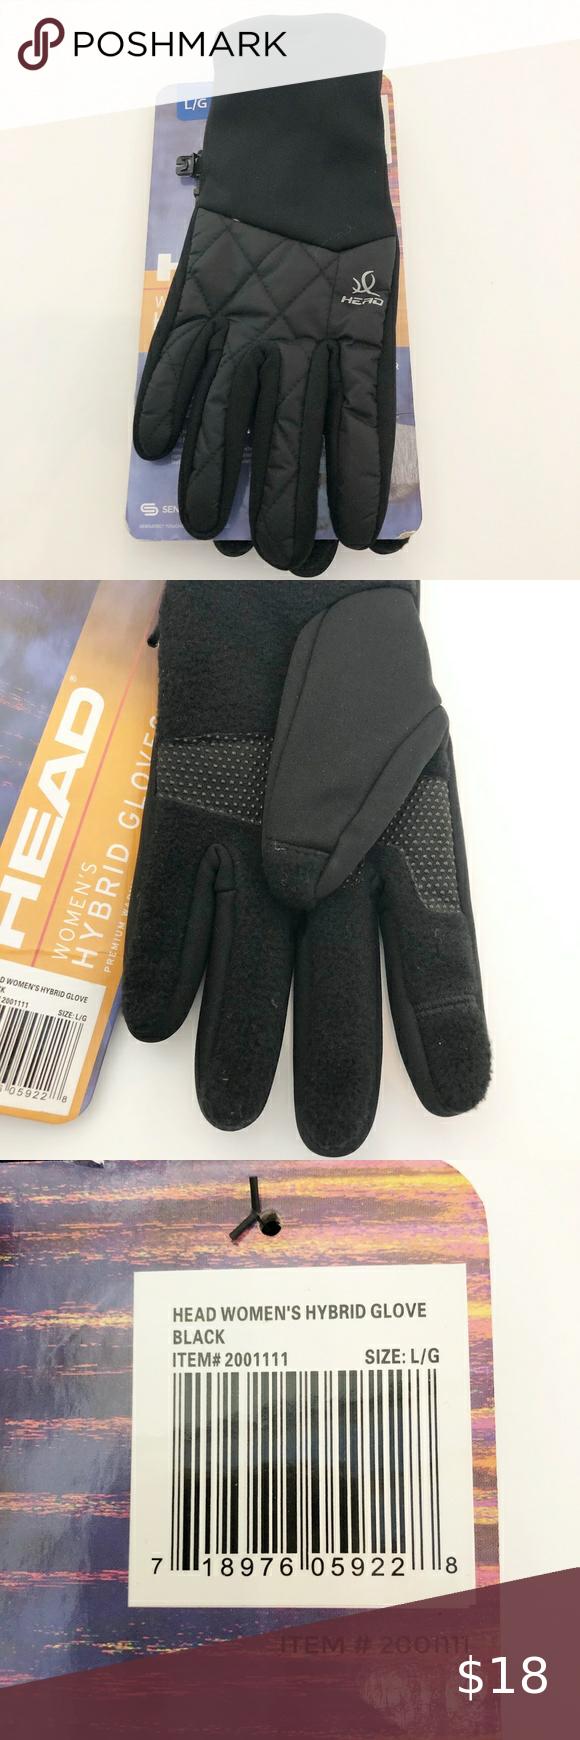 HEAD Women/'s Hybrid Gloves Touchscreen Technology